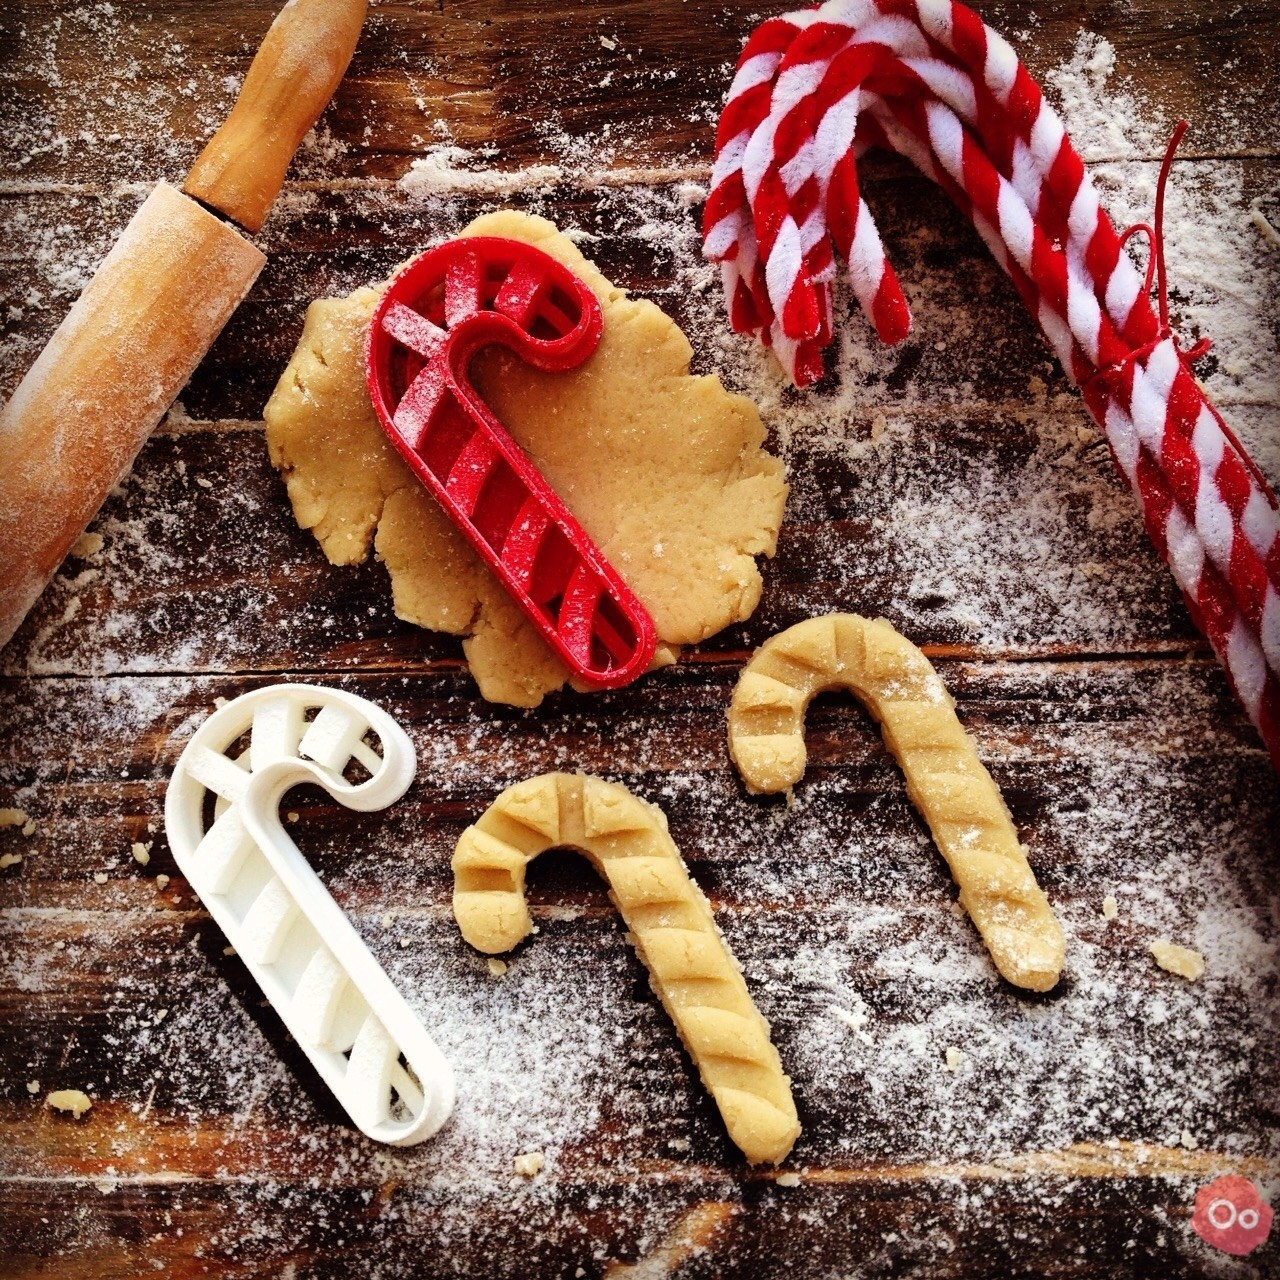 Candy_Cane_Cookie_Cutter_2.jpg Télécharger fichier STL gratuit Candy Cane Cookie Cutter • Design à imprimer en 3D, OogiMe